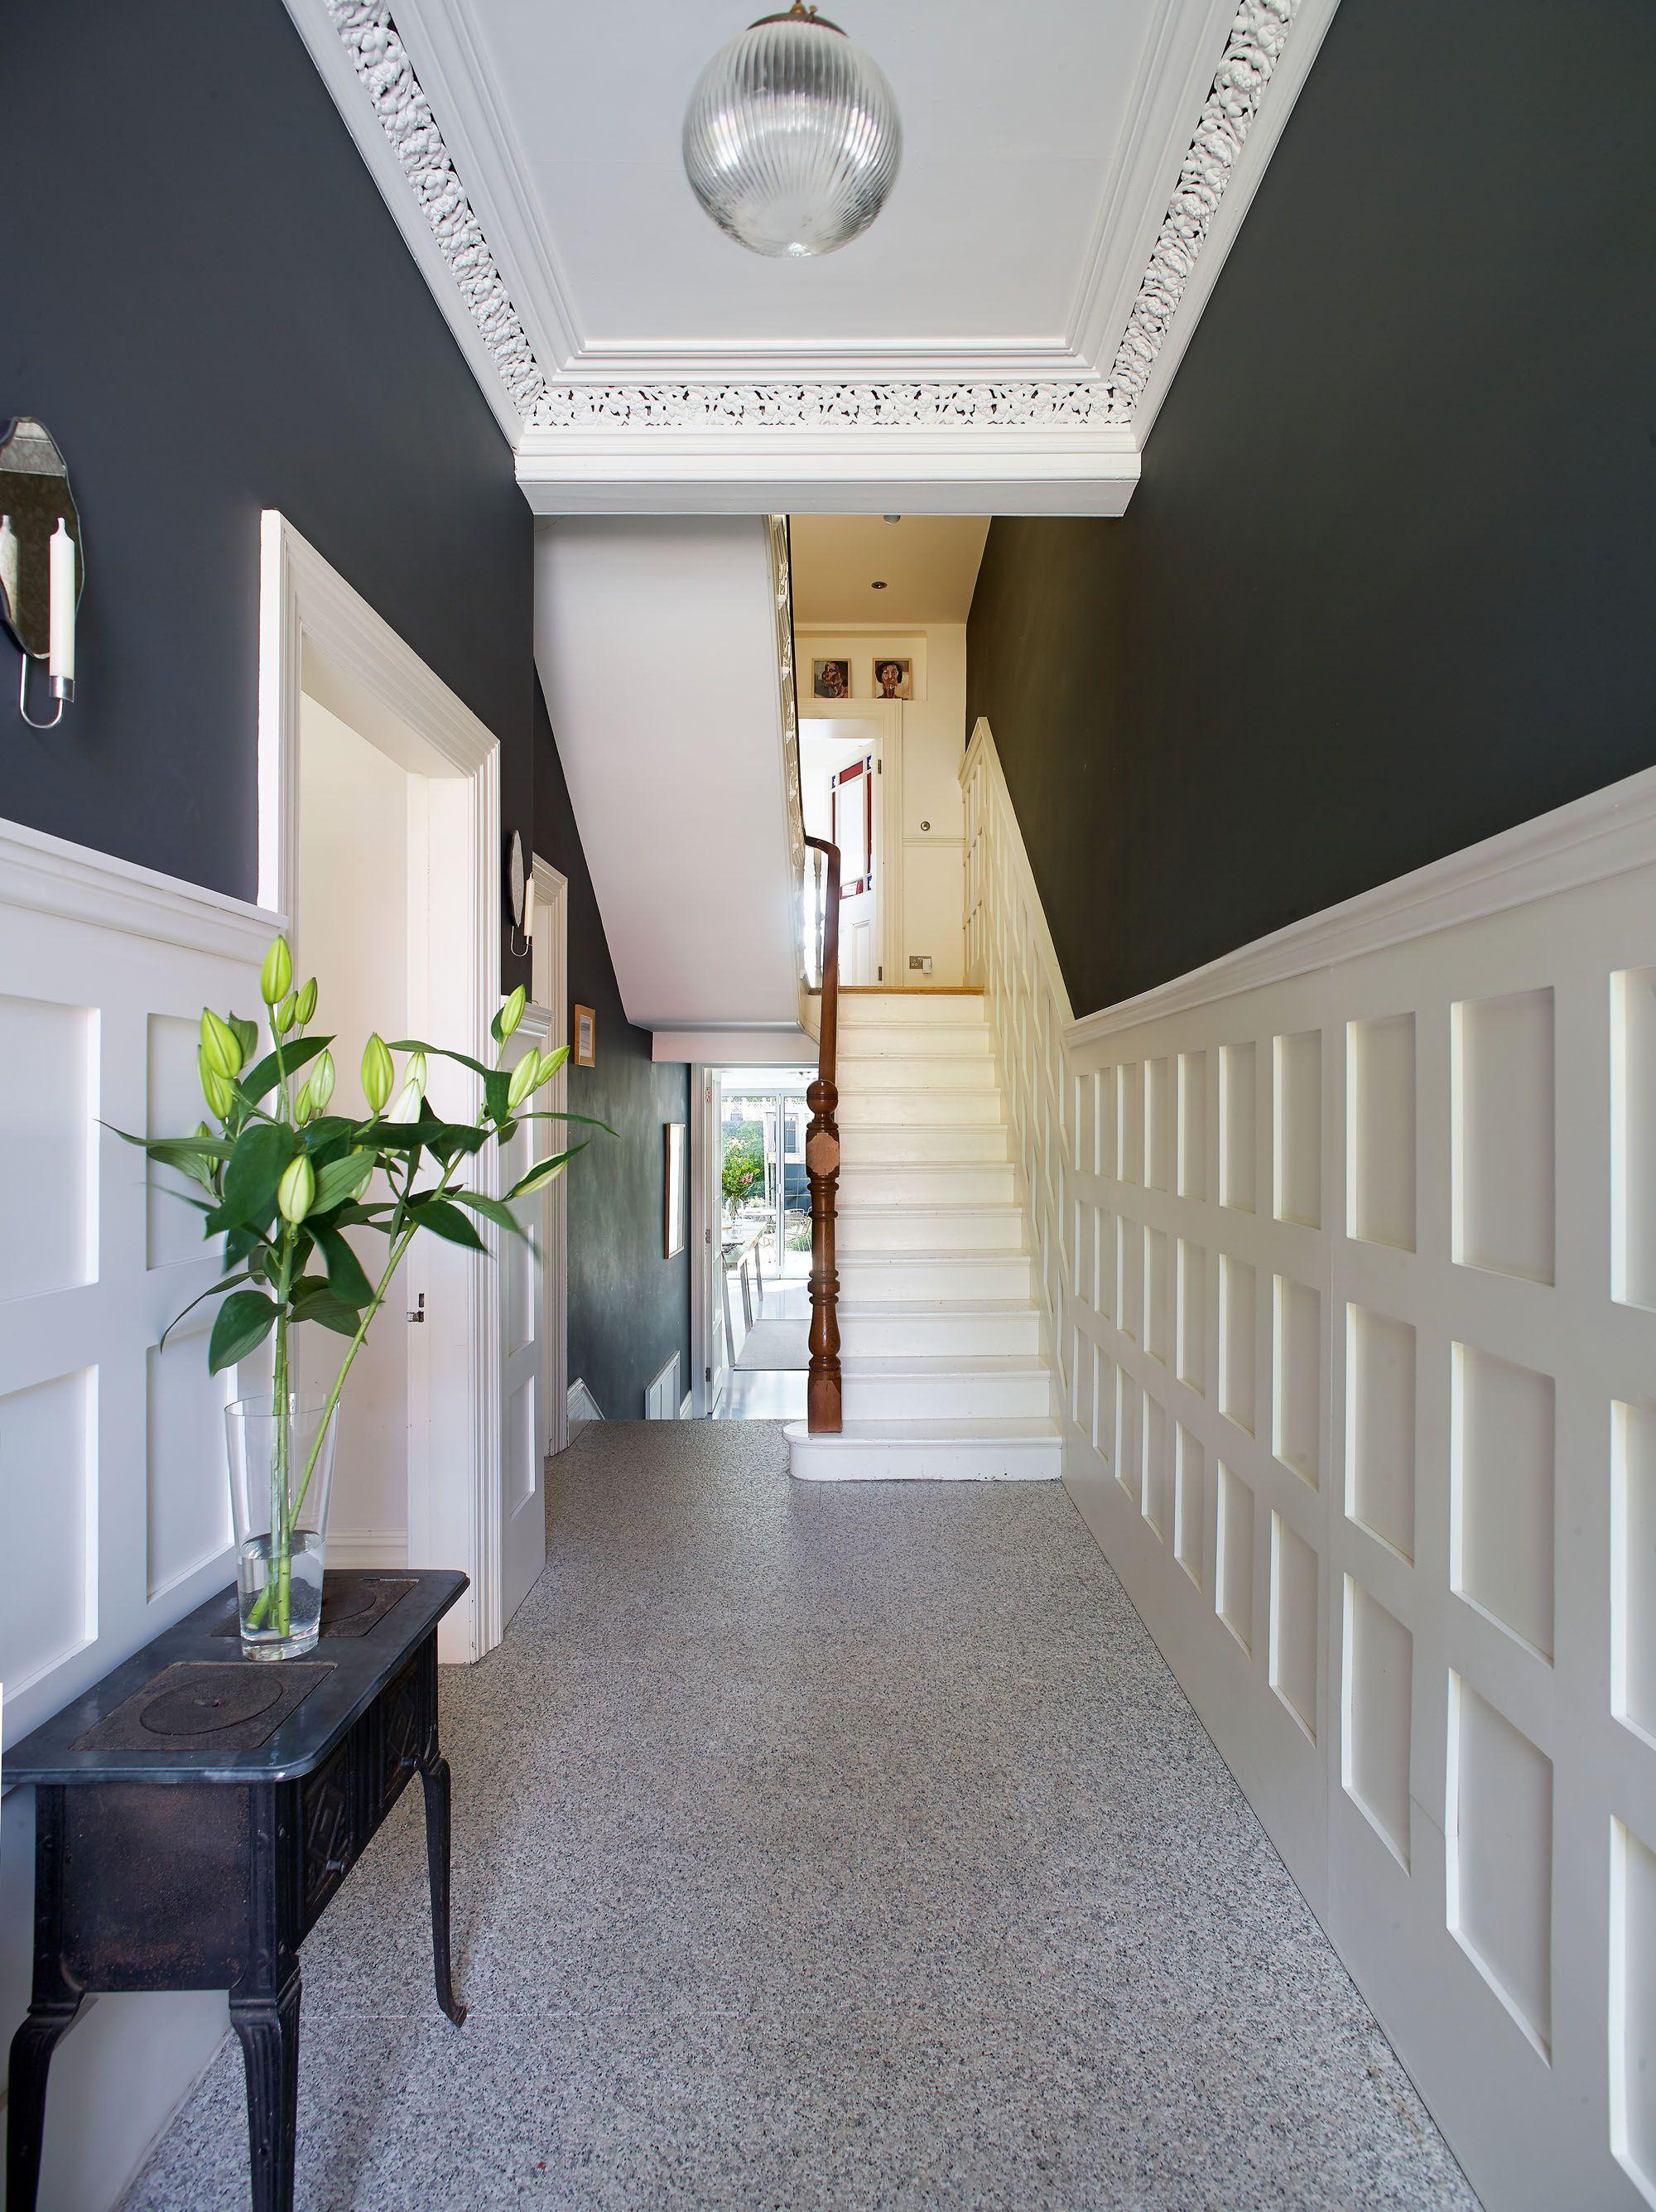 1930s hallway decorating ideas Pin by John on Home Renovations  Pinterest  Hall Entrance halls